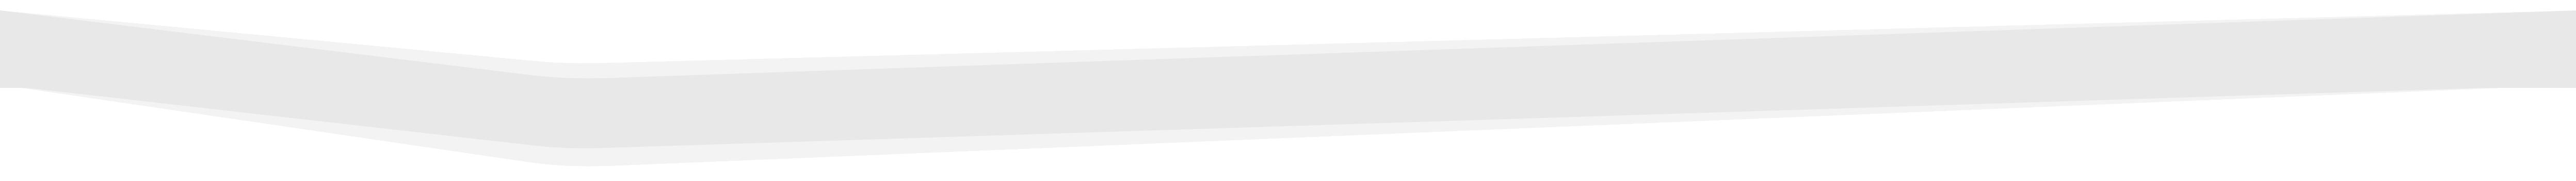 gray separator2 trans